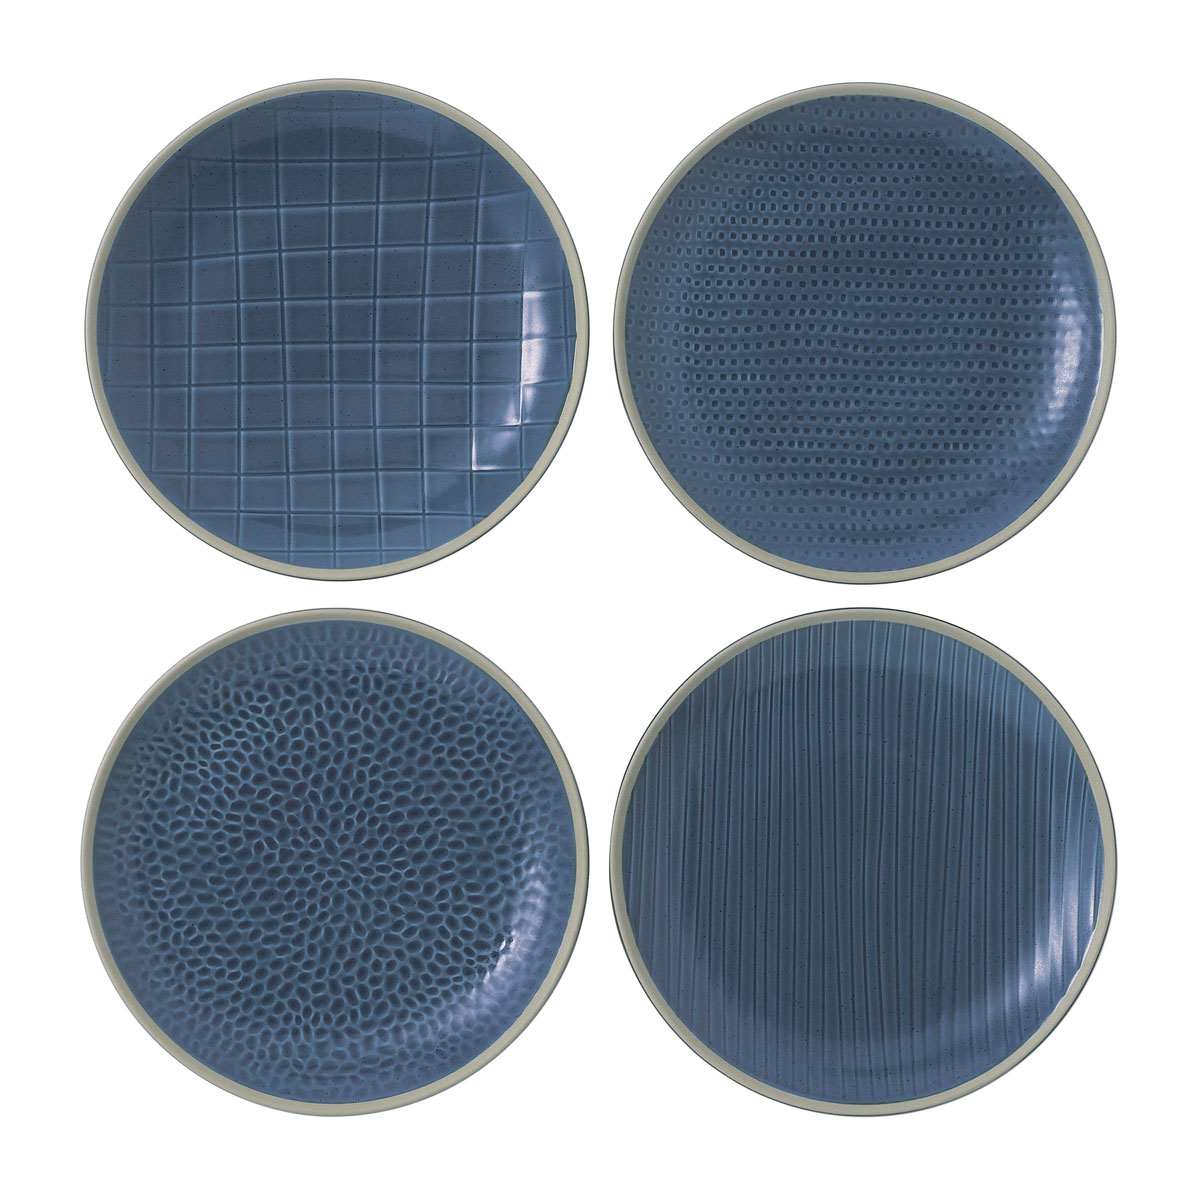 "Royal Doulton Gordon Ramsay Maze Grill Blue Salad Plate 9"" Set of 4 Mixed"